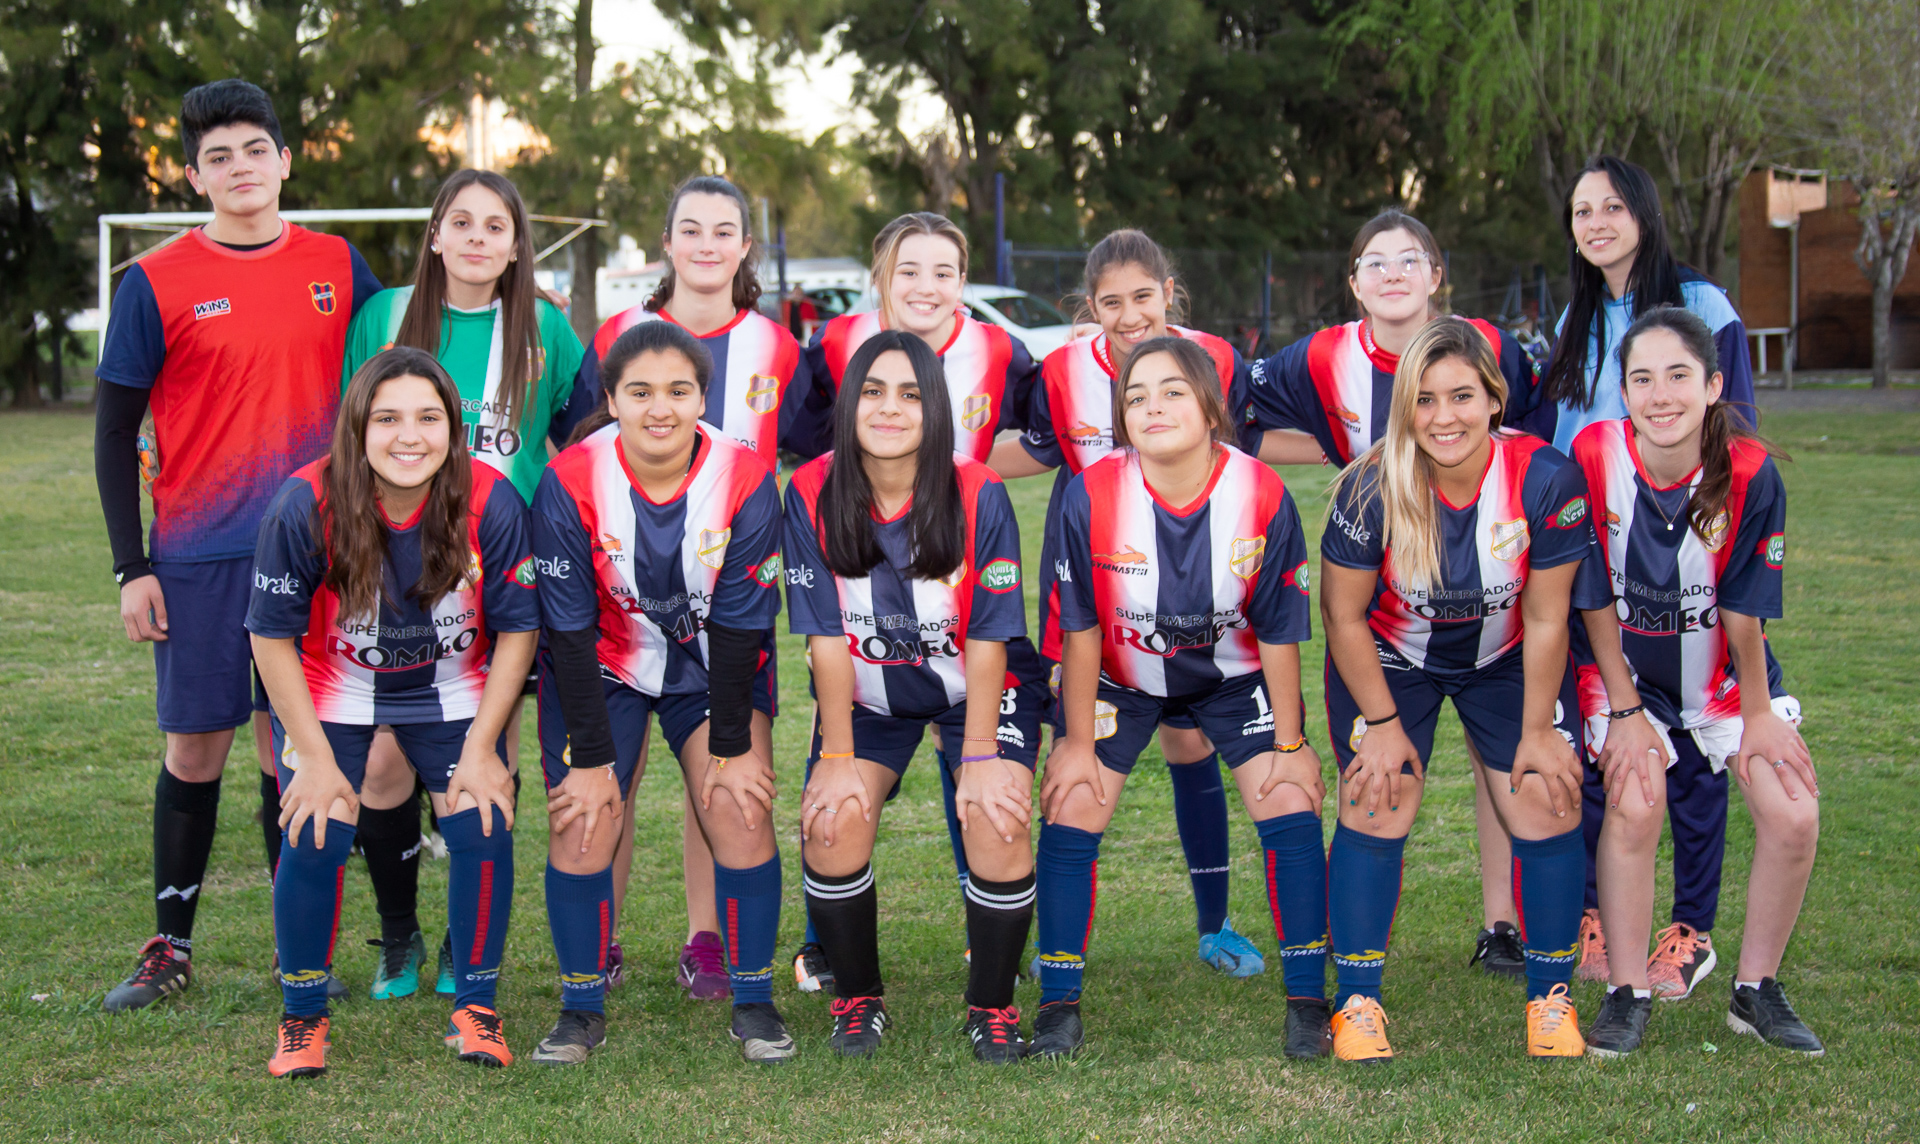 https://elfronton.club/wp-content/uploads/2019/09/futbol_femenino-inferiores-el-fronton.jpg